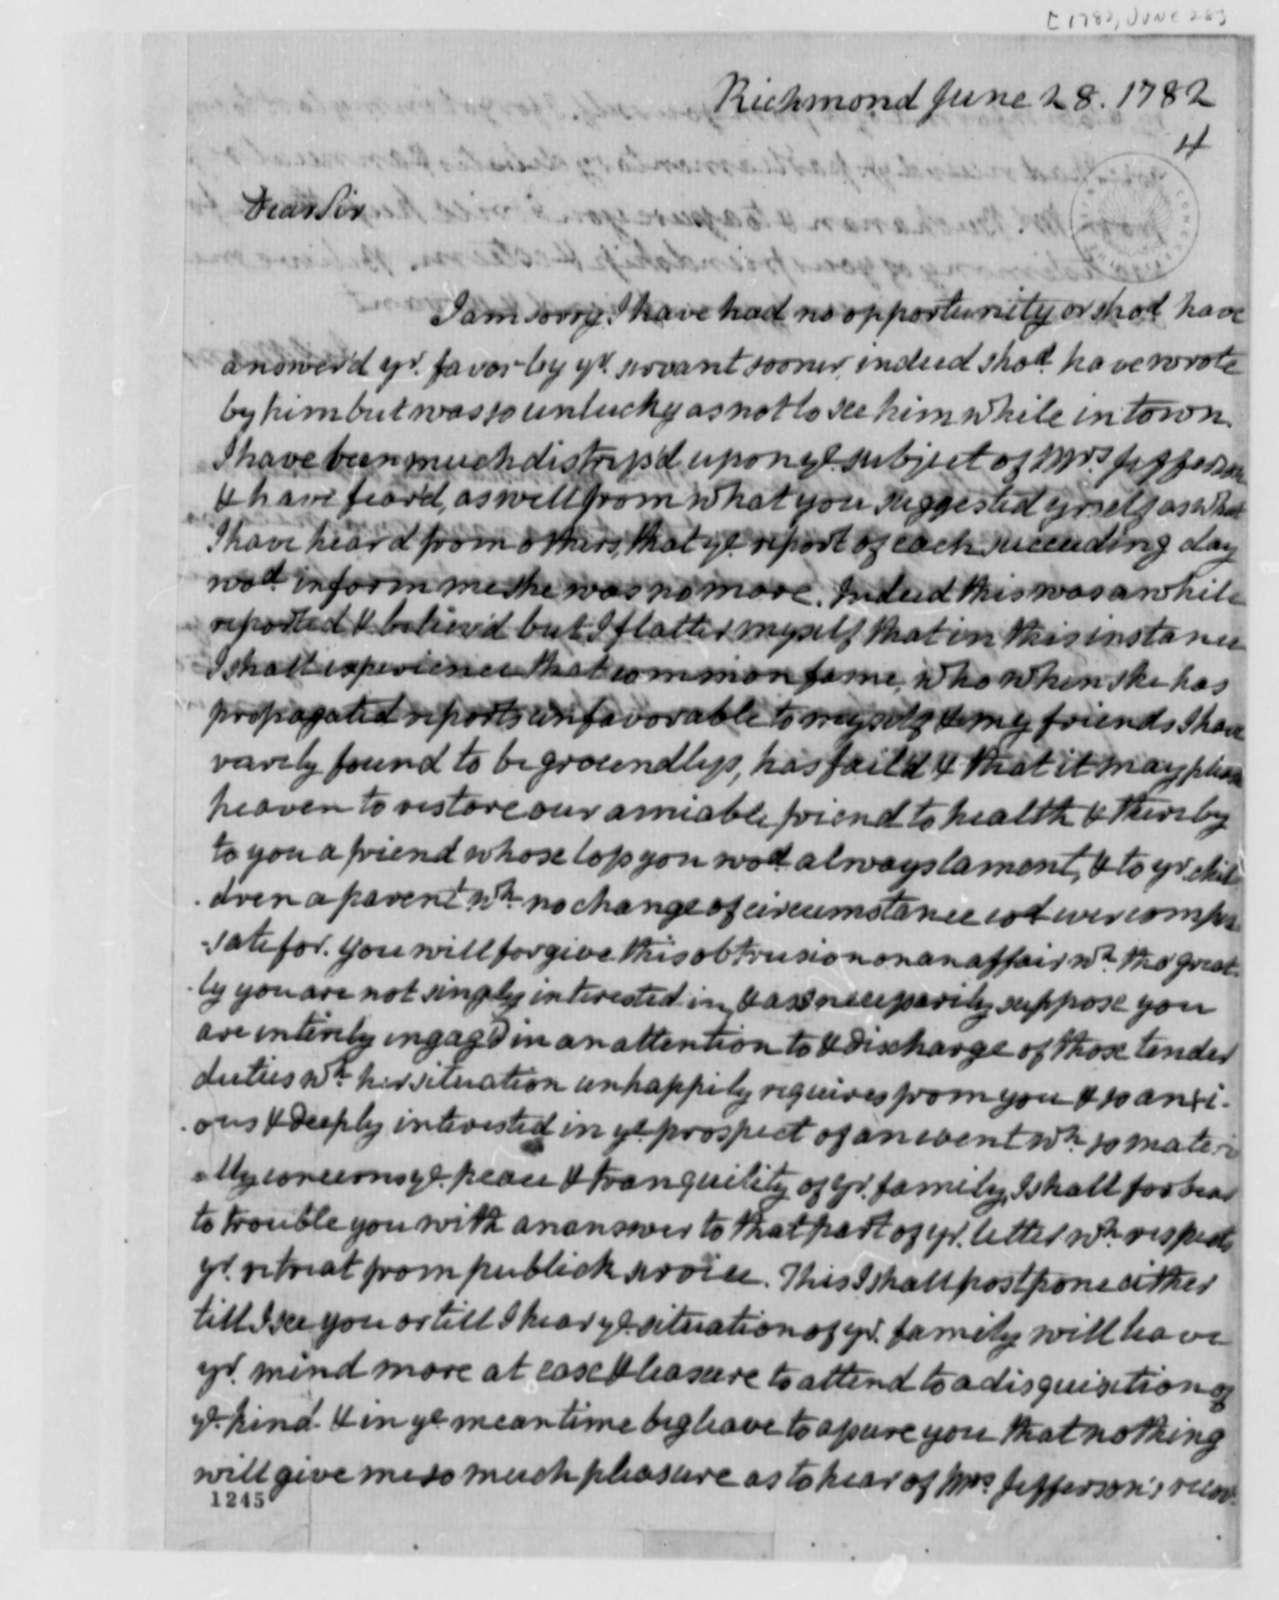 James Monroe to Thomas Jefferson, June 28, 1782